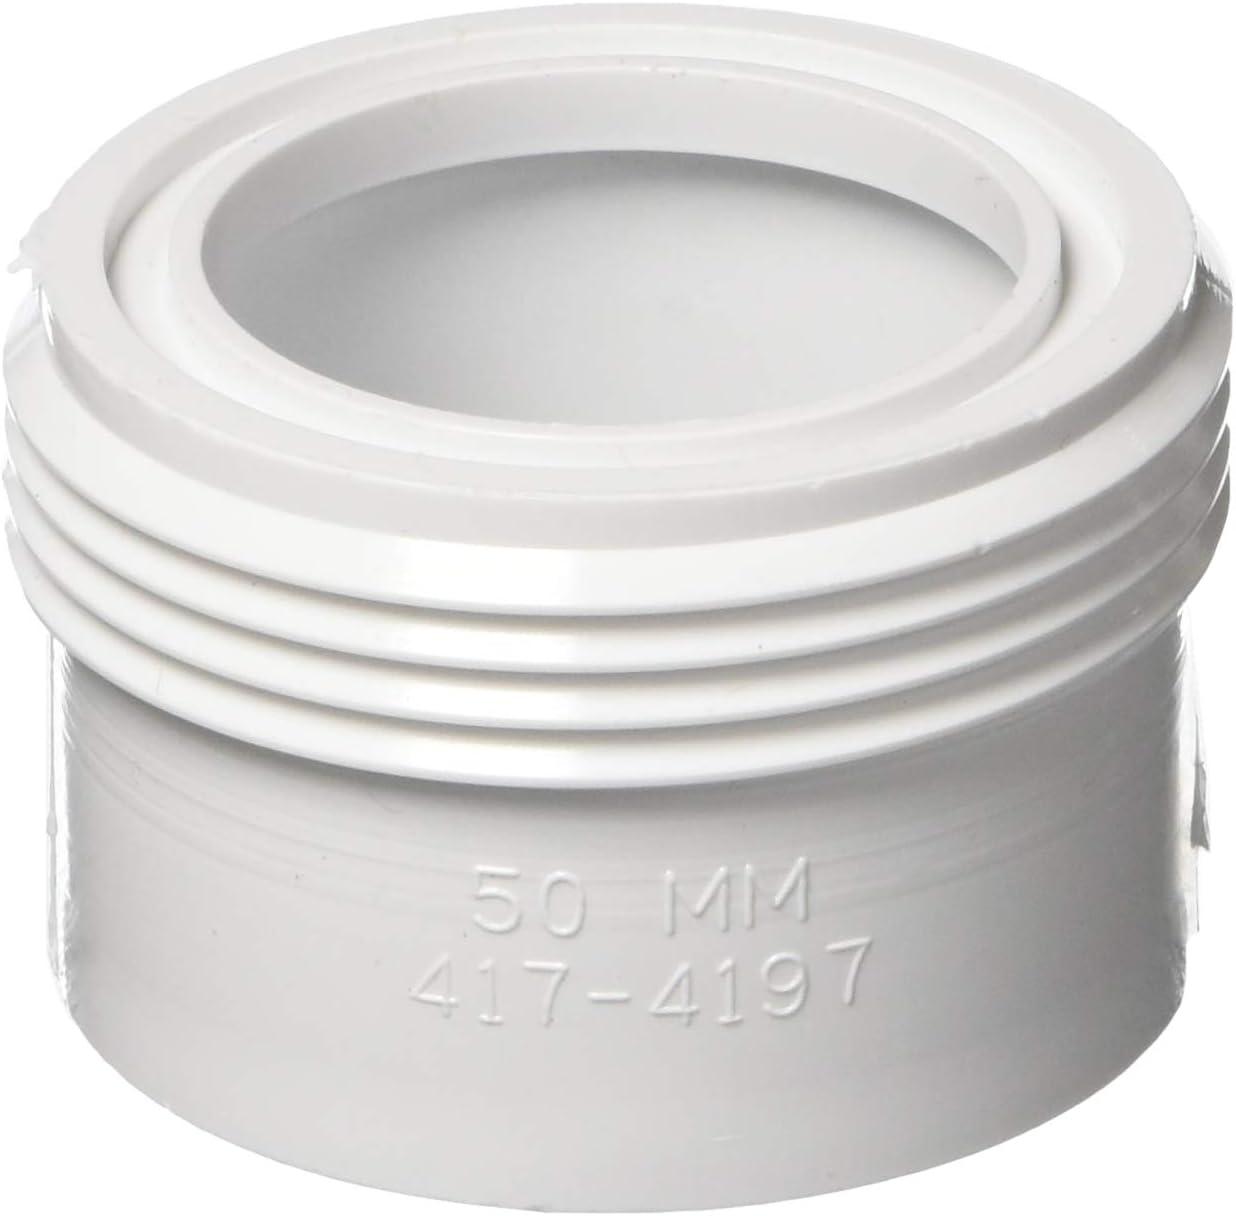 "Spa Pool Hot Tub 2/"" Flow Heater Union Split Nut /& PVC Tail Piece Kit 0611-20"